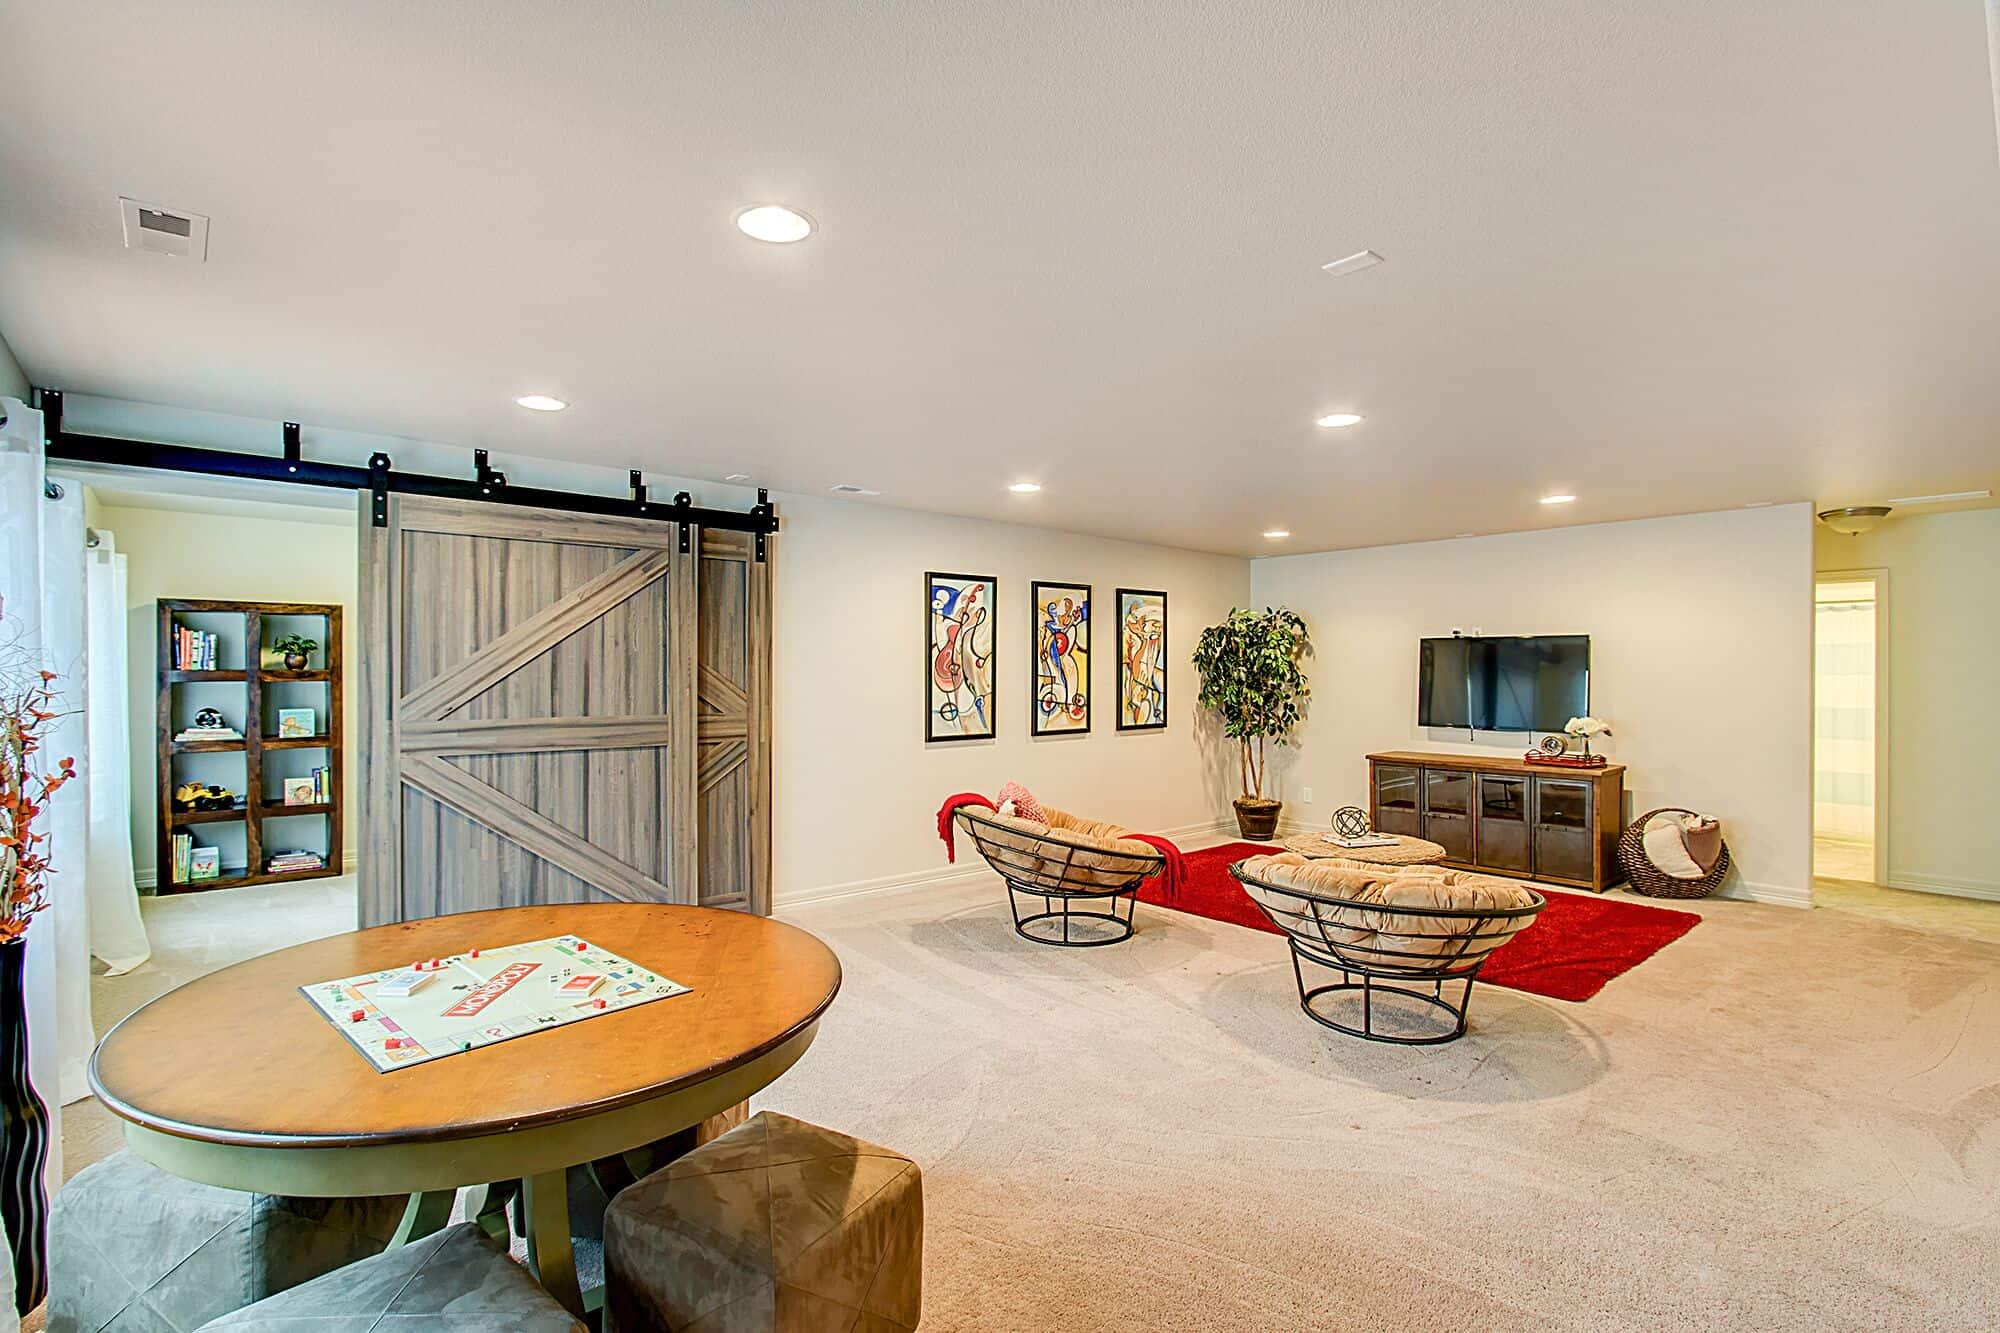 Recreation Room into Office/Flex Room with Barn Doors